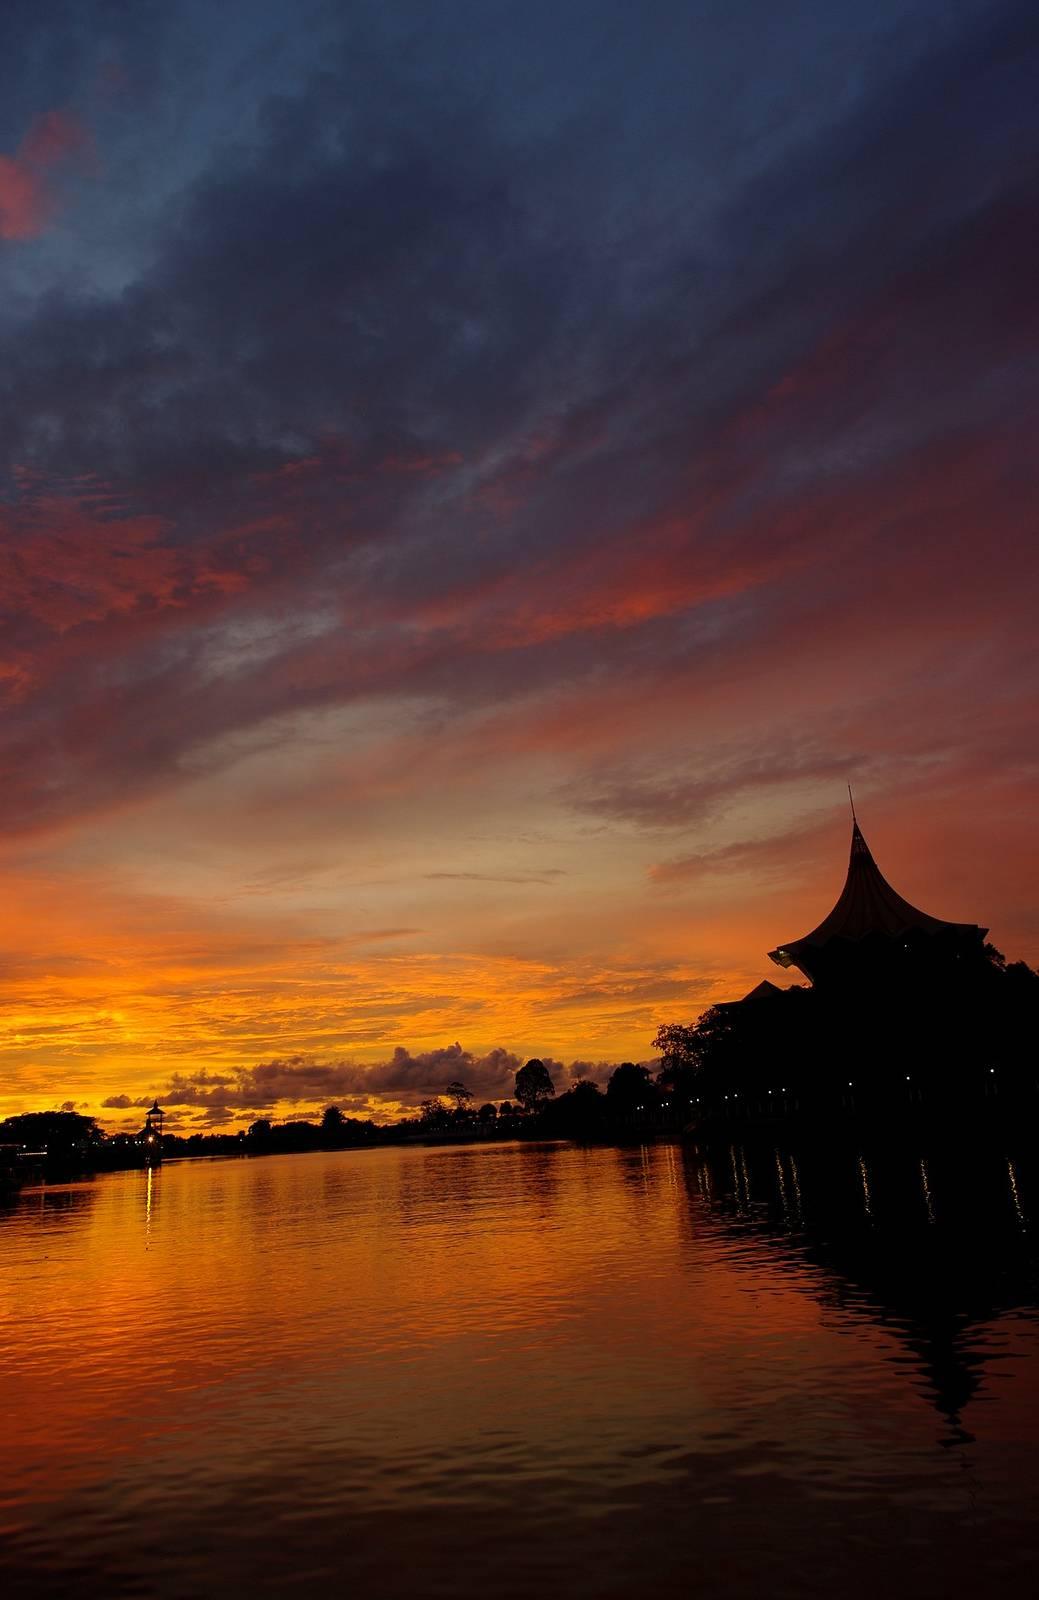 Photo 1: Balade au couché de soleil à Kuching